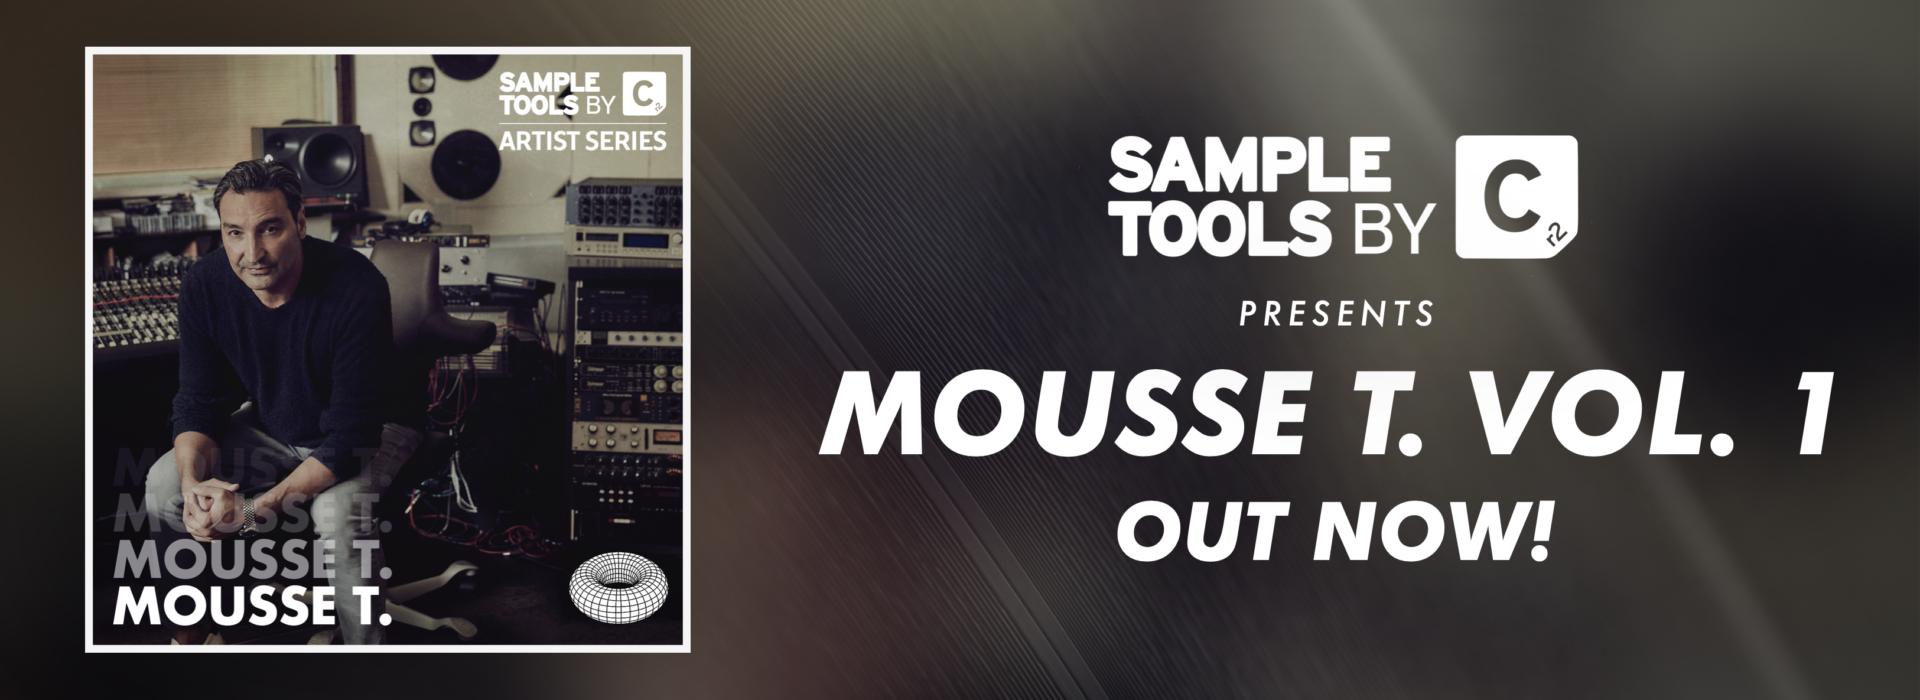 MOUSSE T. VOL. 1 || OUT NOW